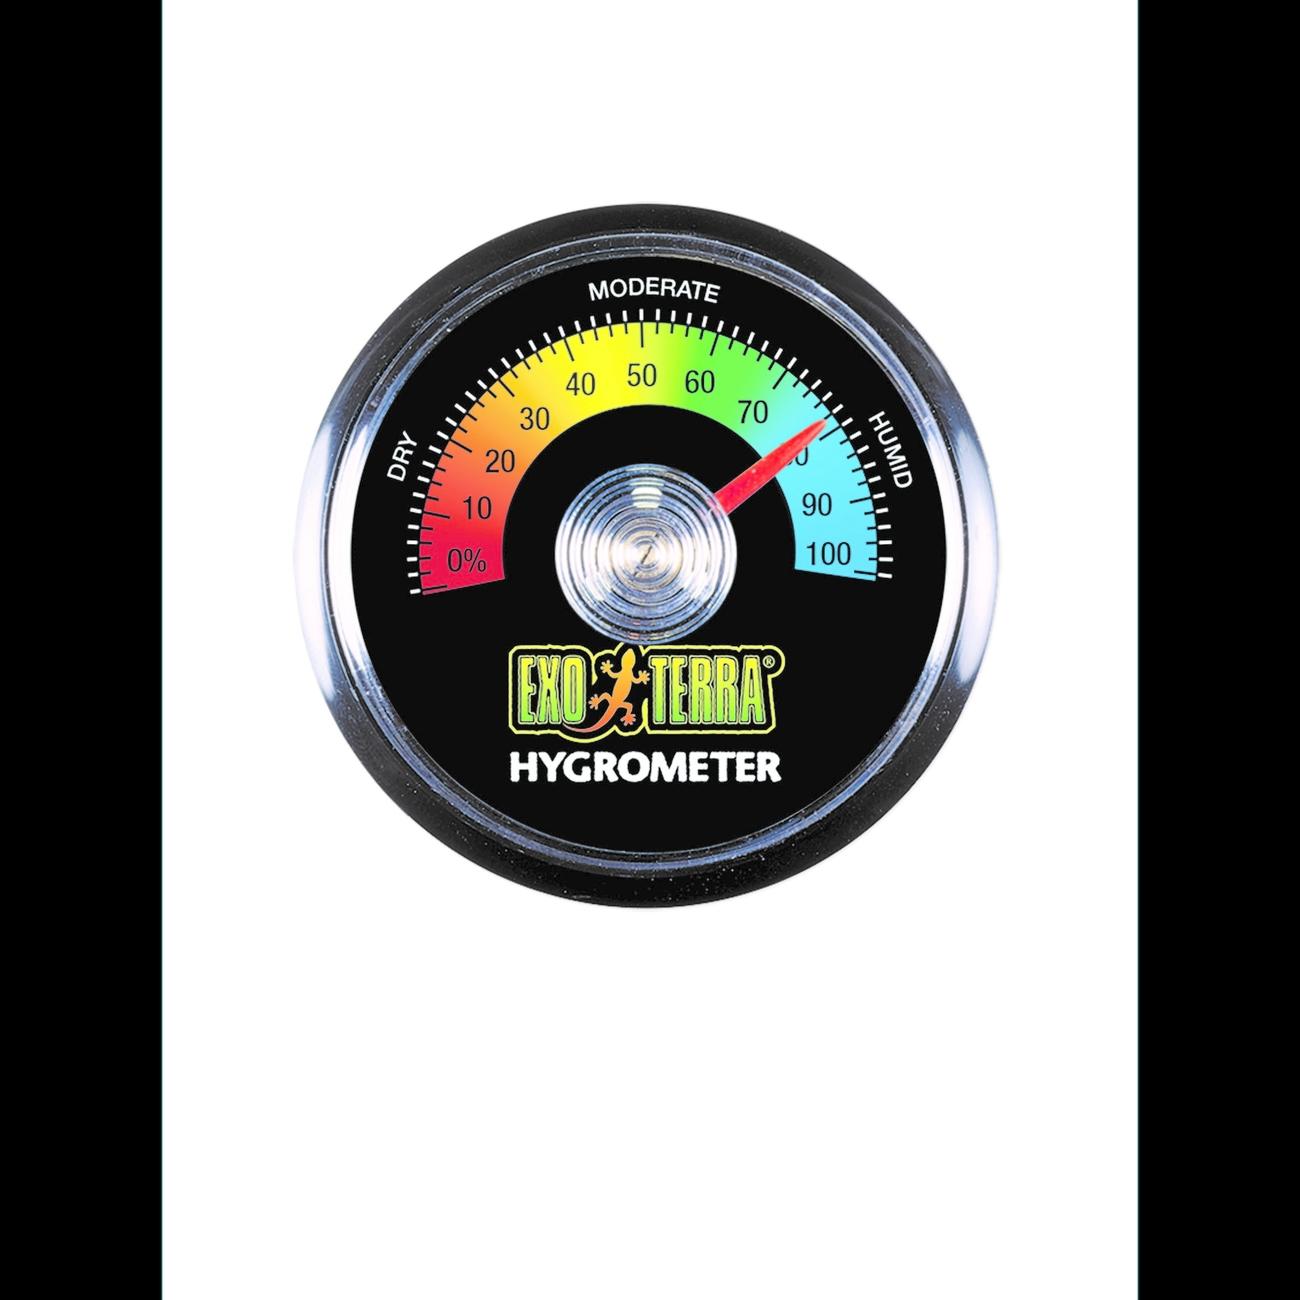 Exo Terra -  Hygrometer Rept-O-Meter, Bild 2